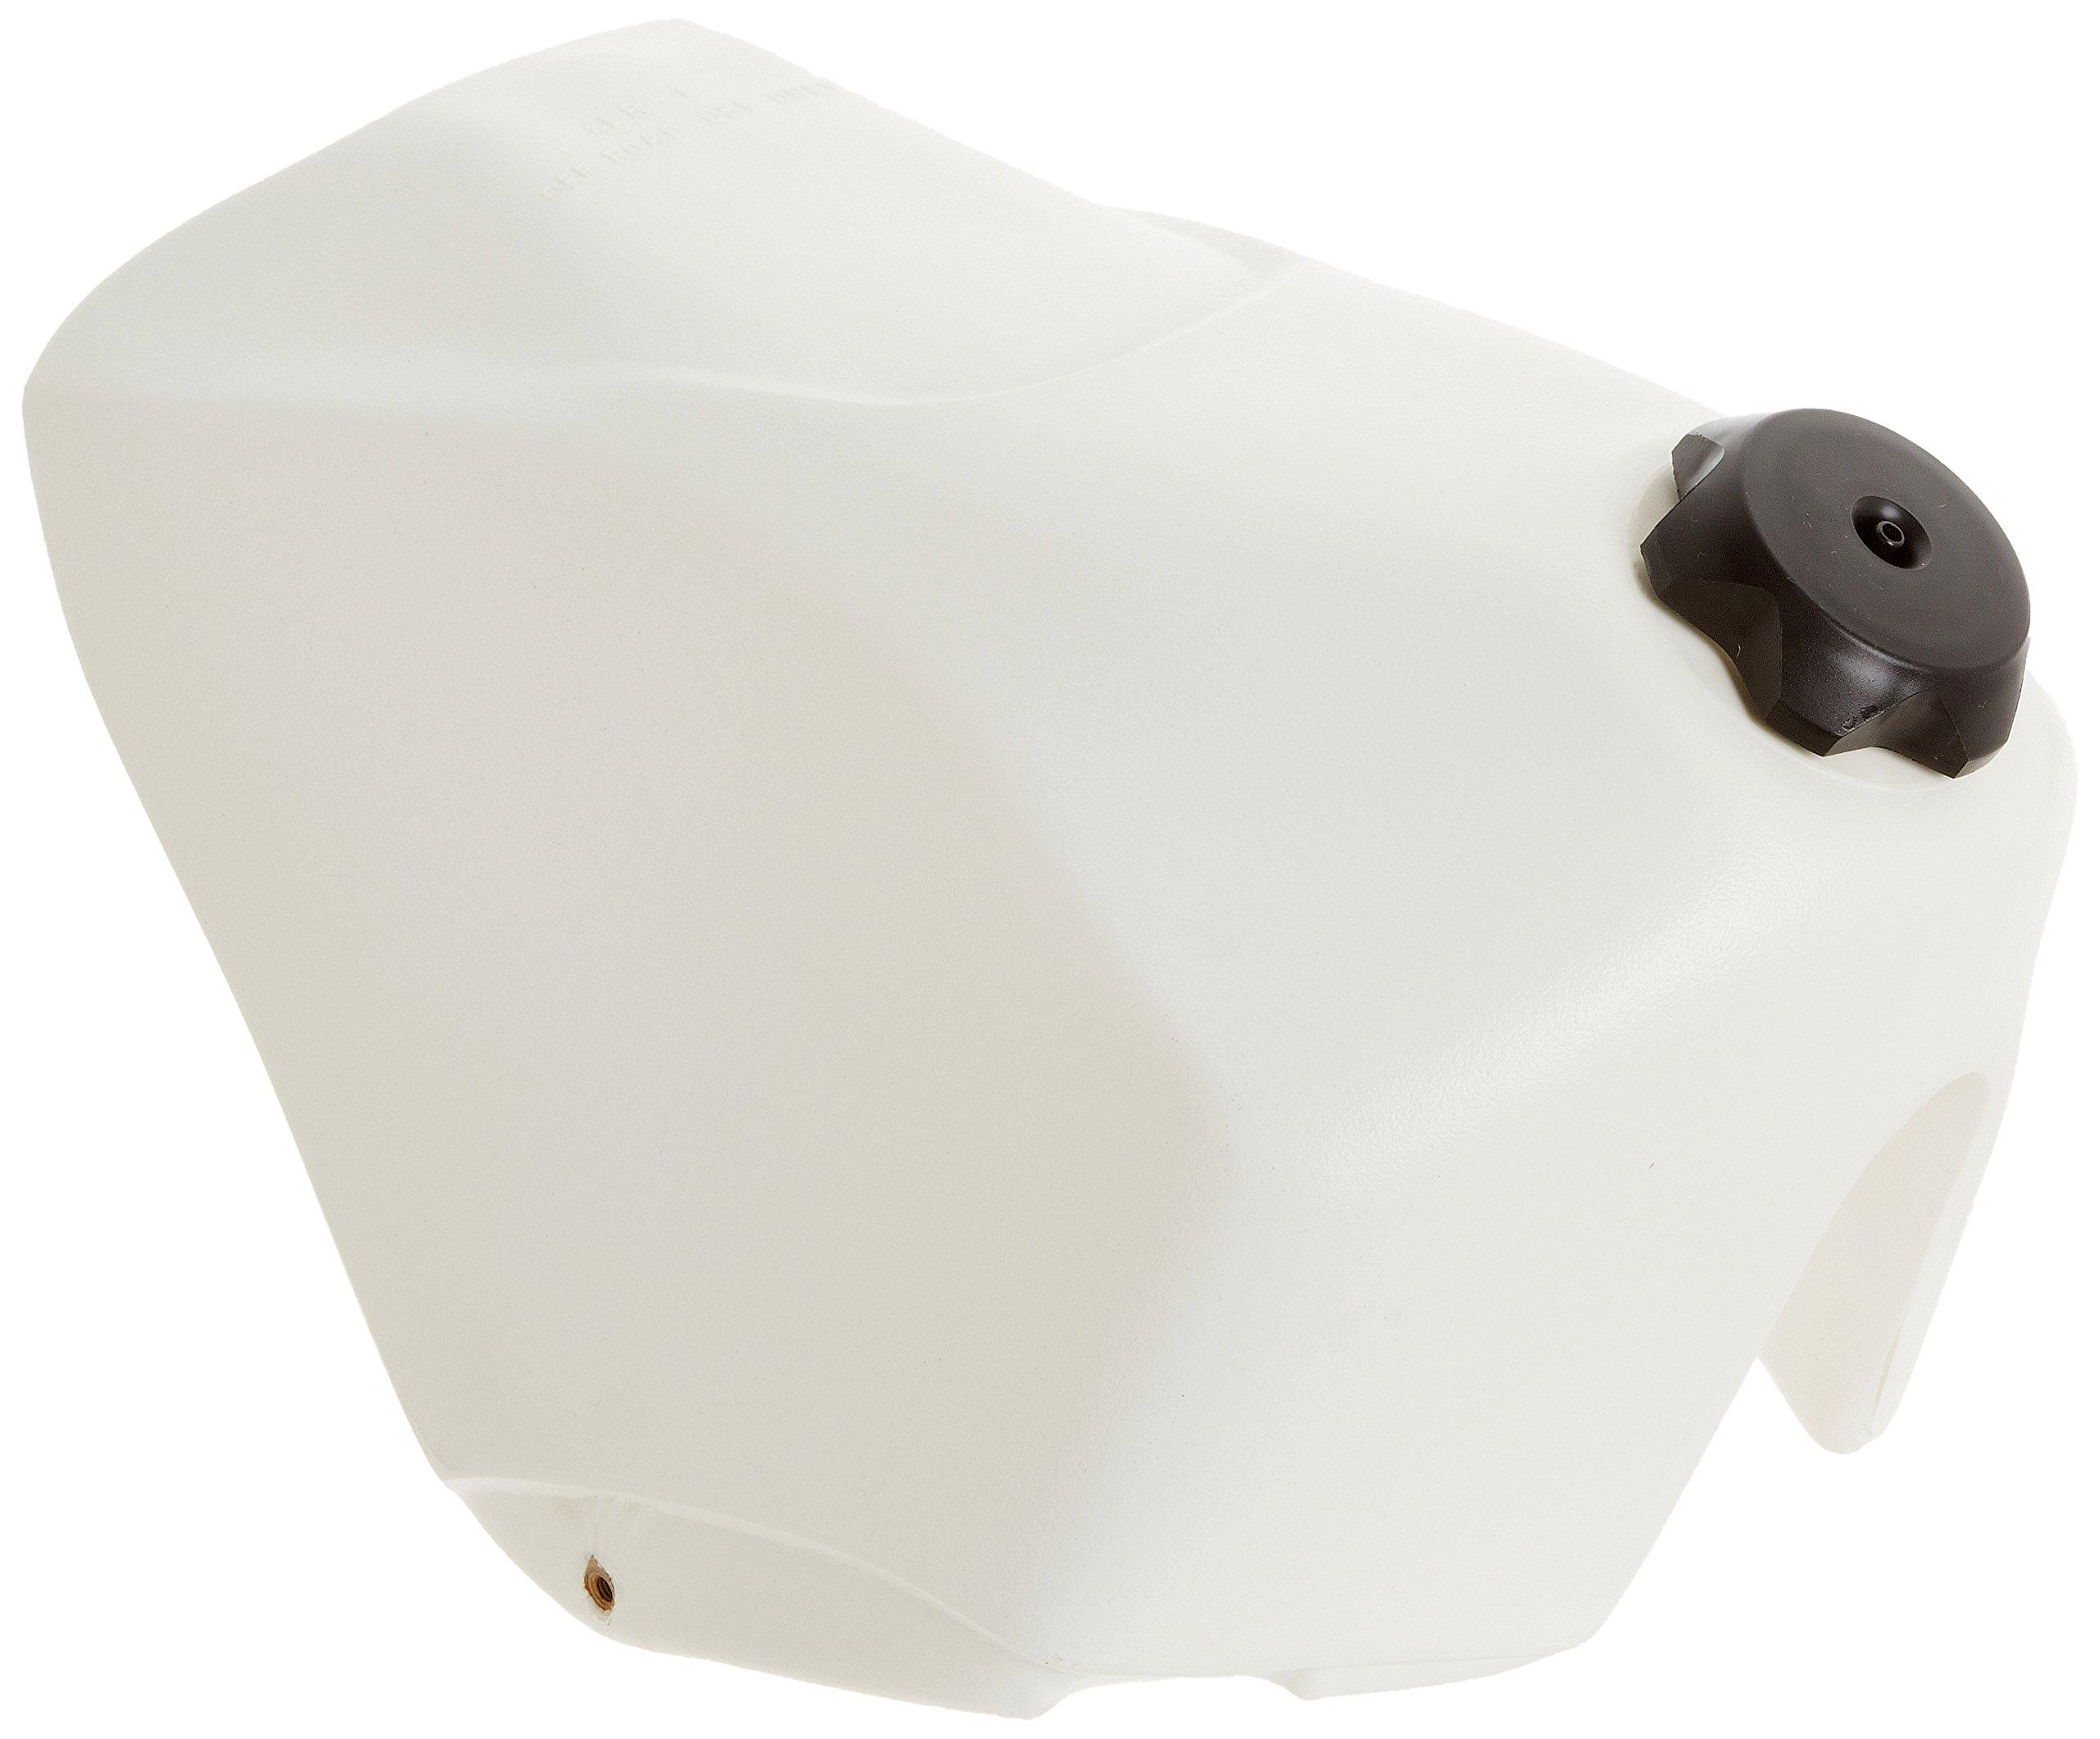 IMS 113117W1 White Large Fuel Tank - 3.2 Gallon Capacity